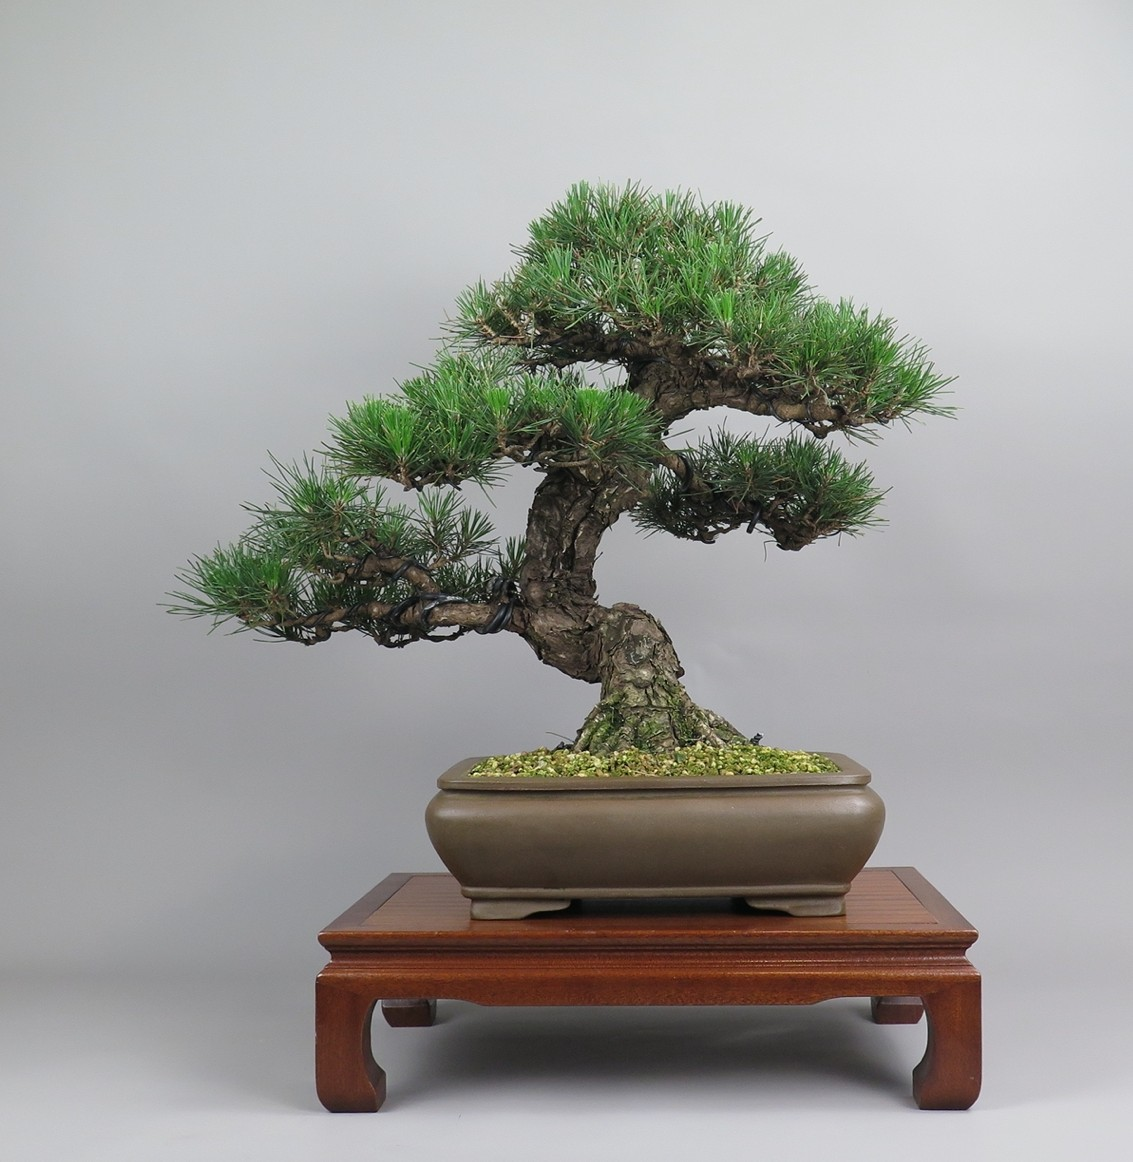 Bonsai de pinus tumbergii, espalda.